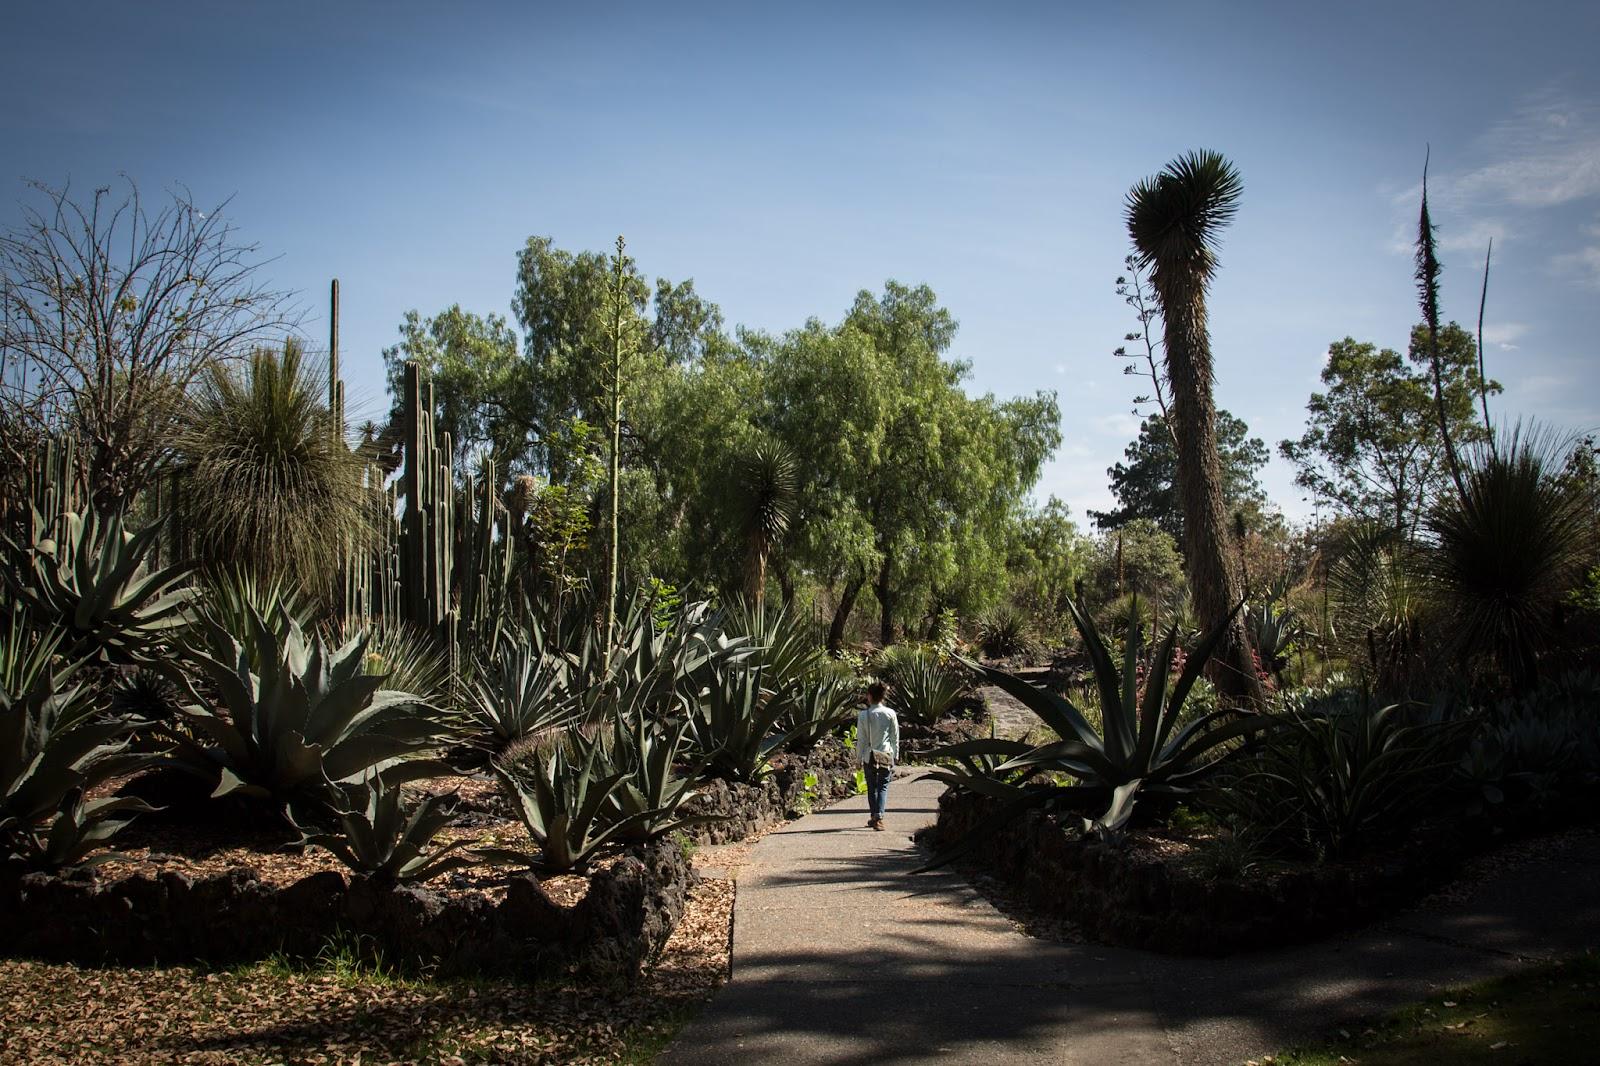 Jardin-Botanico-UNAM-7.jpg